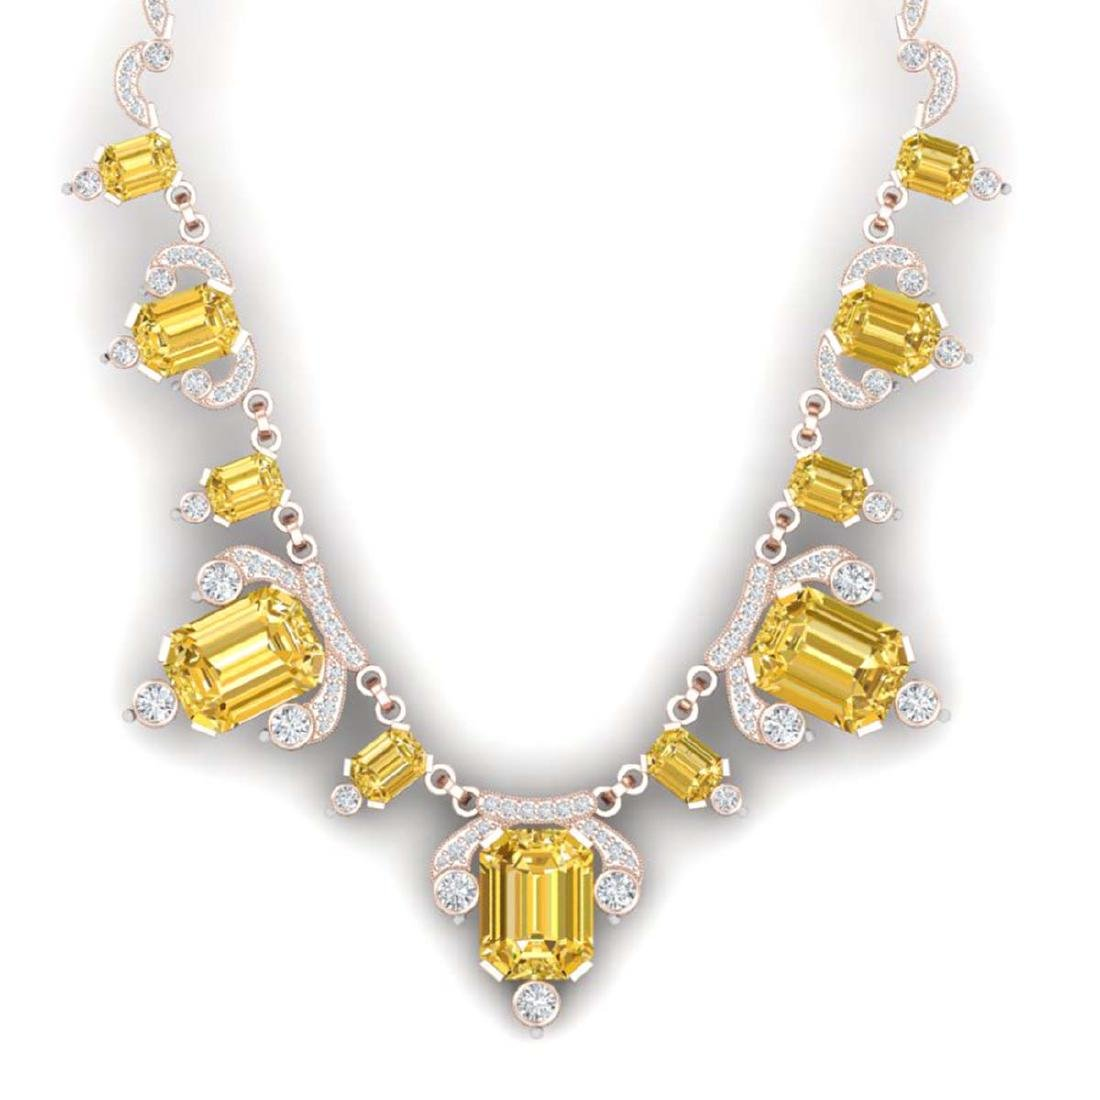 71.48 ctw Canary Citrine & VS Diamond Necklace 18K Rose